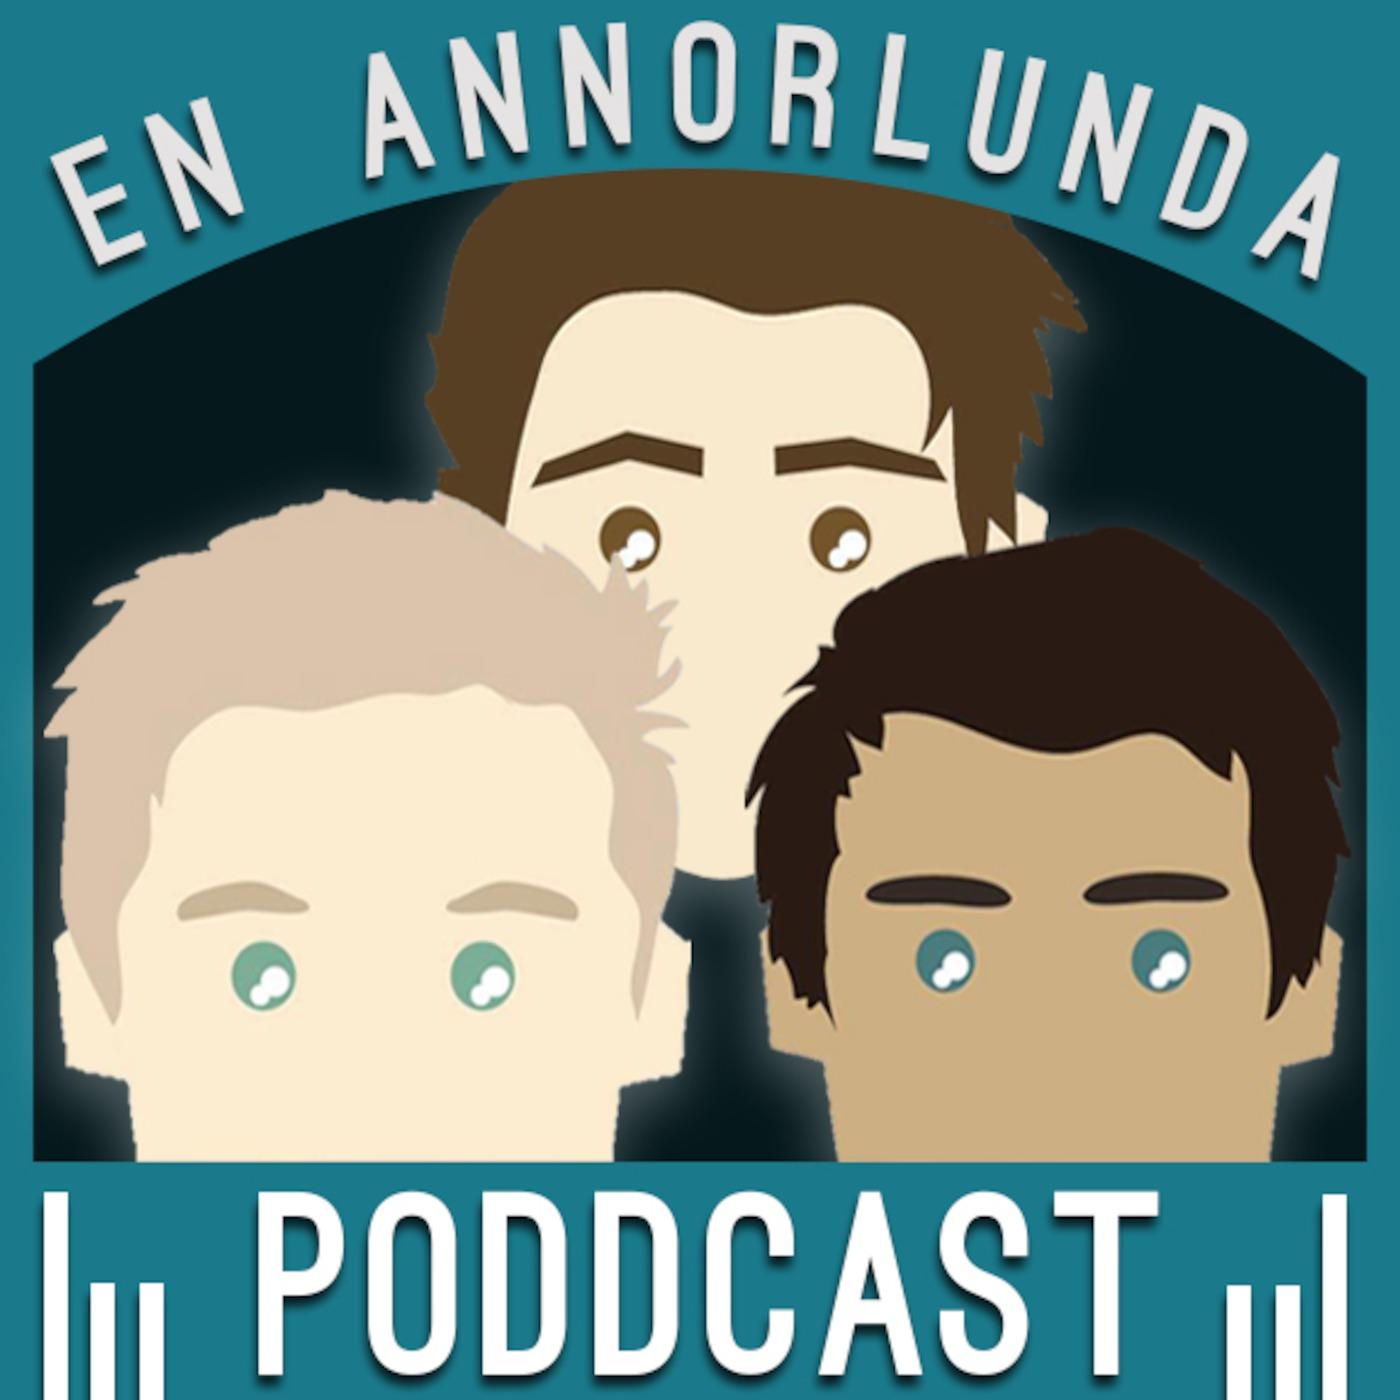 En annorlunda podcast